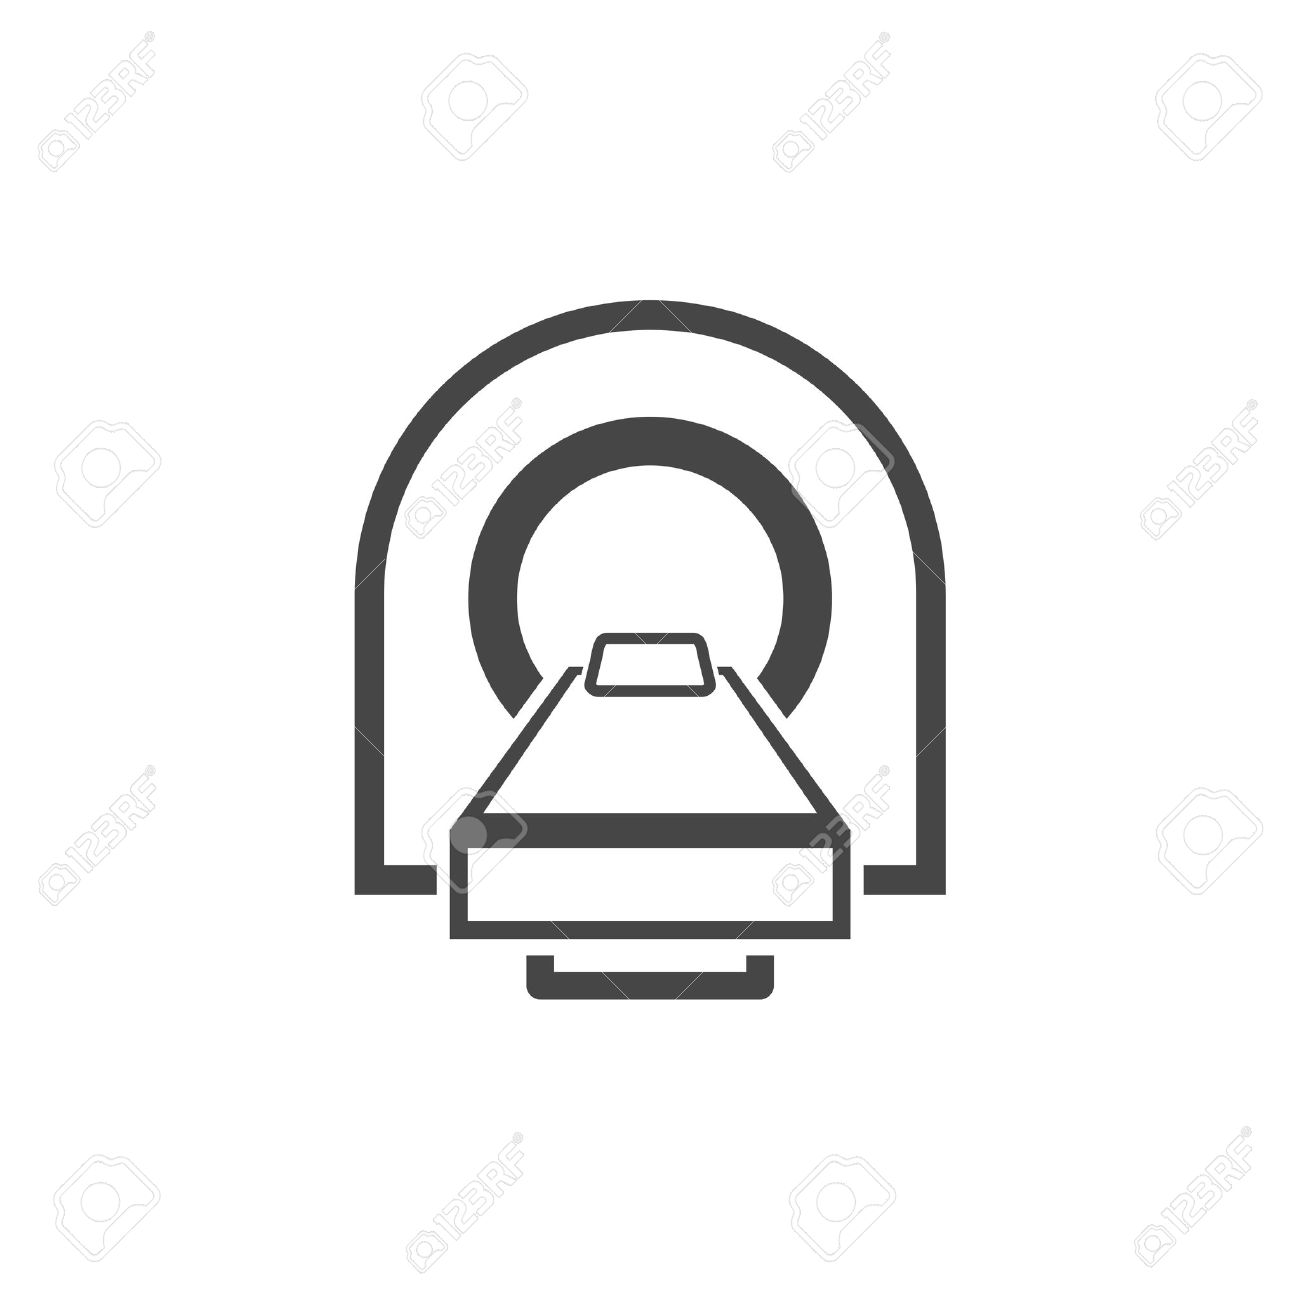 Ct スキャンのアイコン、CT スキャナーのイラスト素材・ベクタ - Image ...